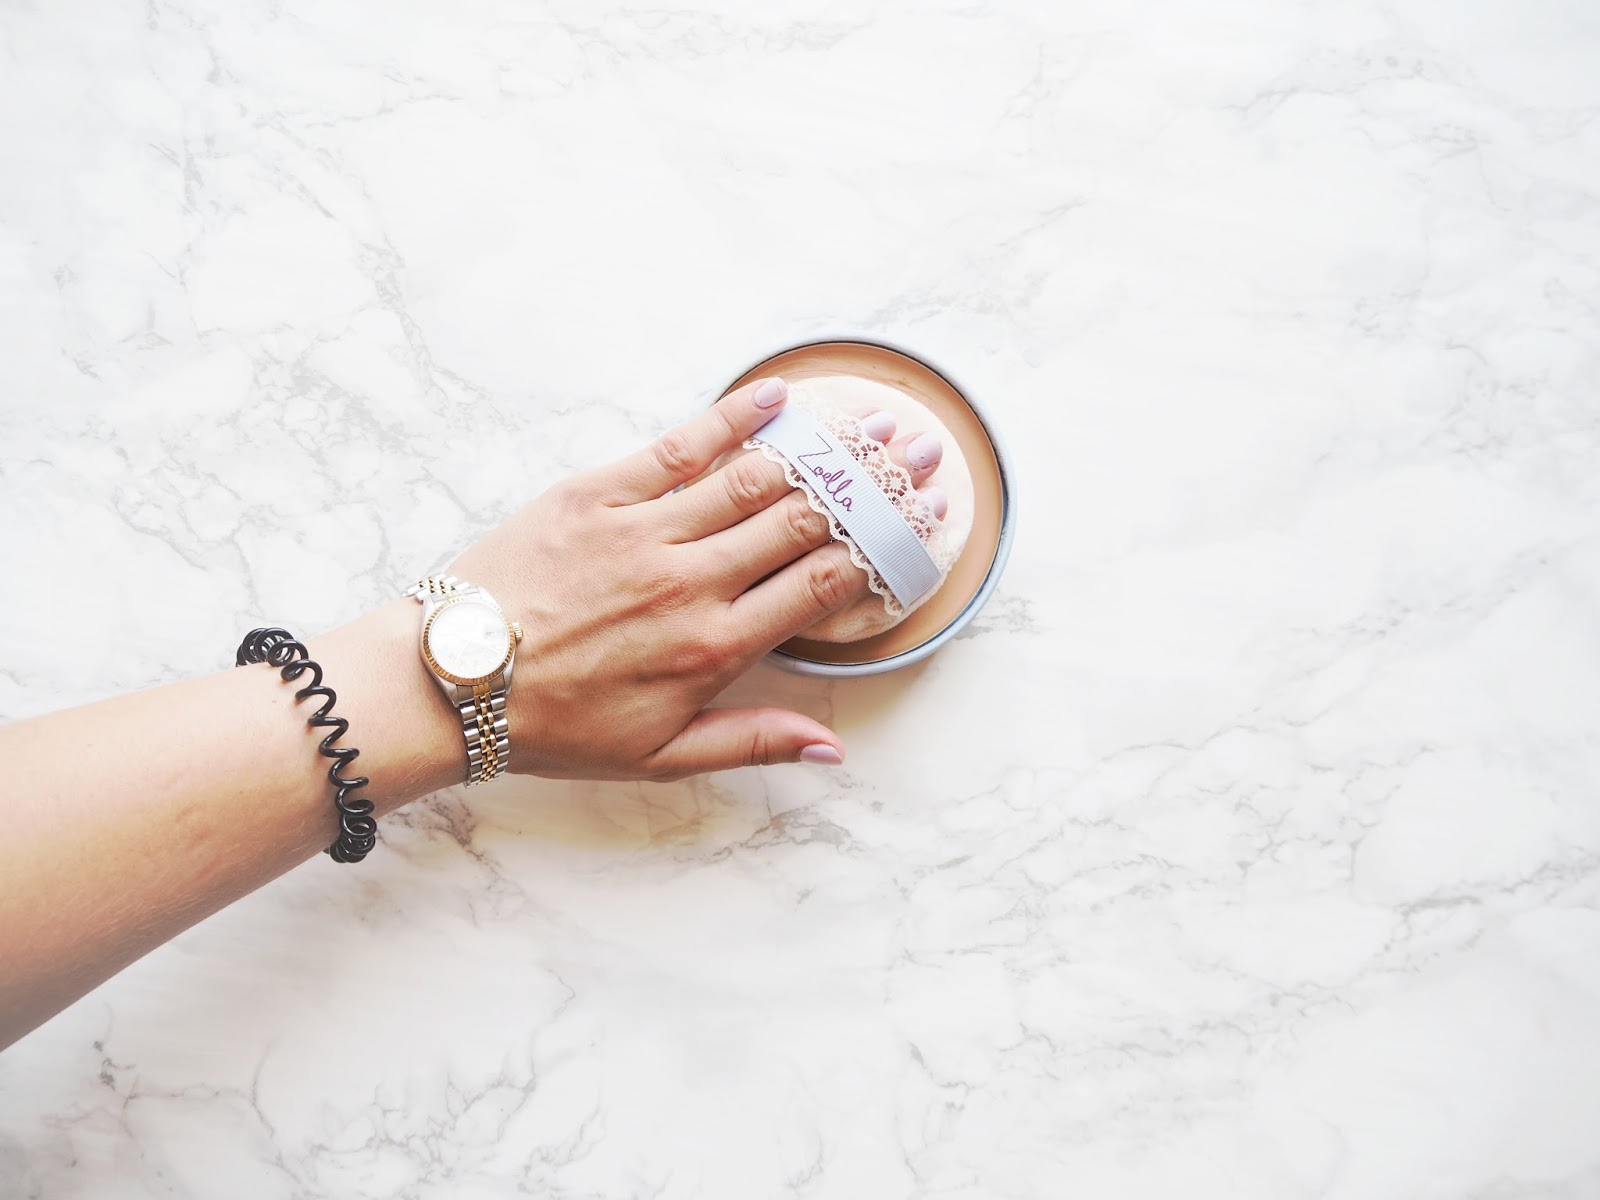 Trying Zoella Beauty, Zoella Beauty Body Fondant, review, zoella makeup